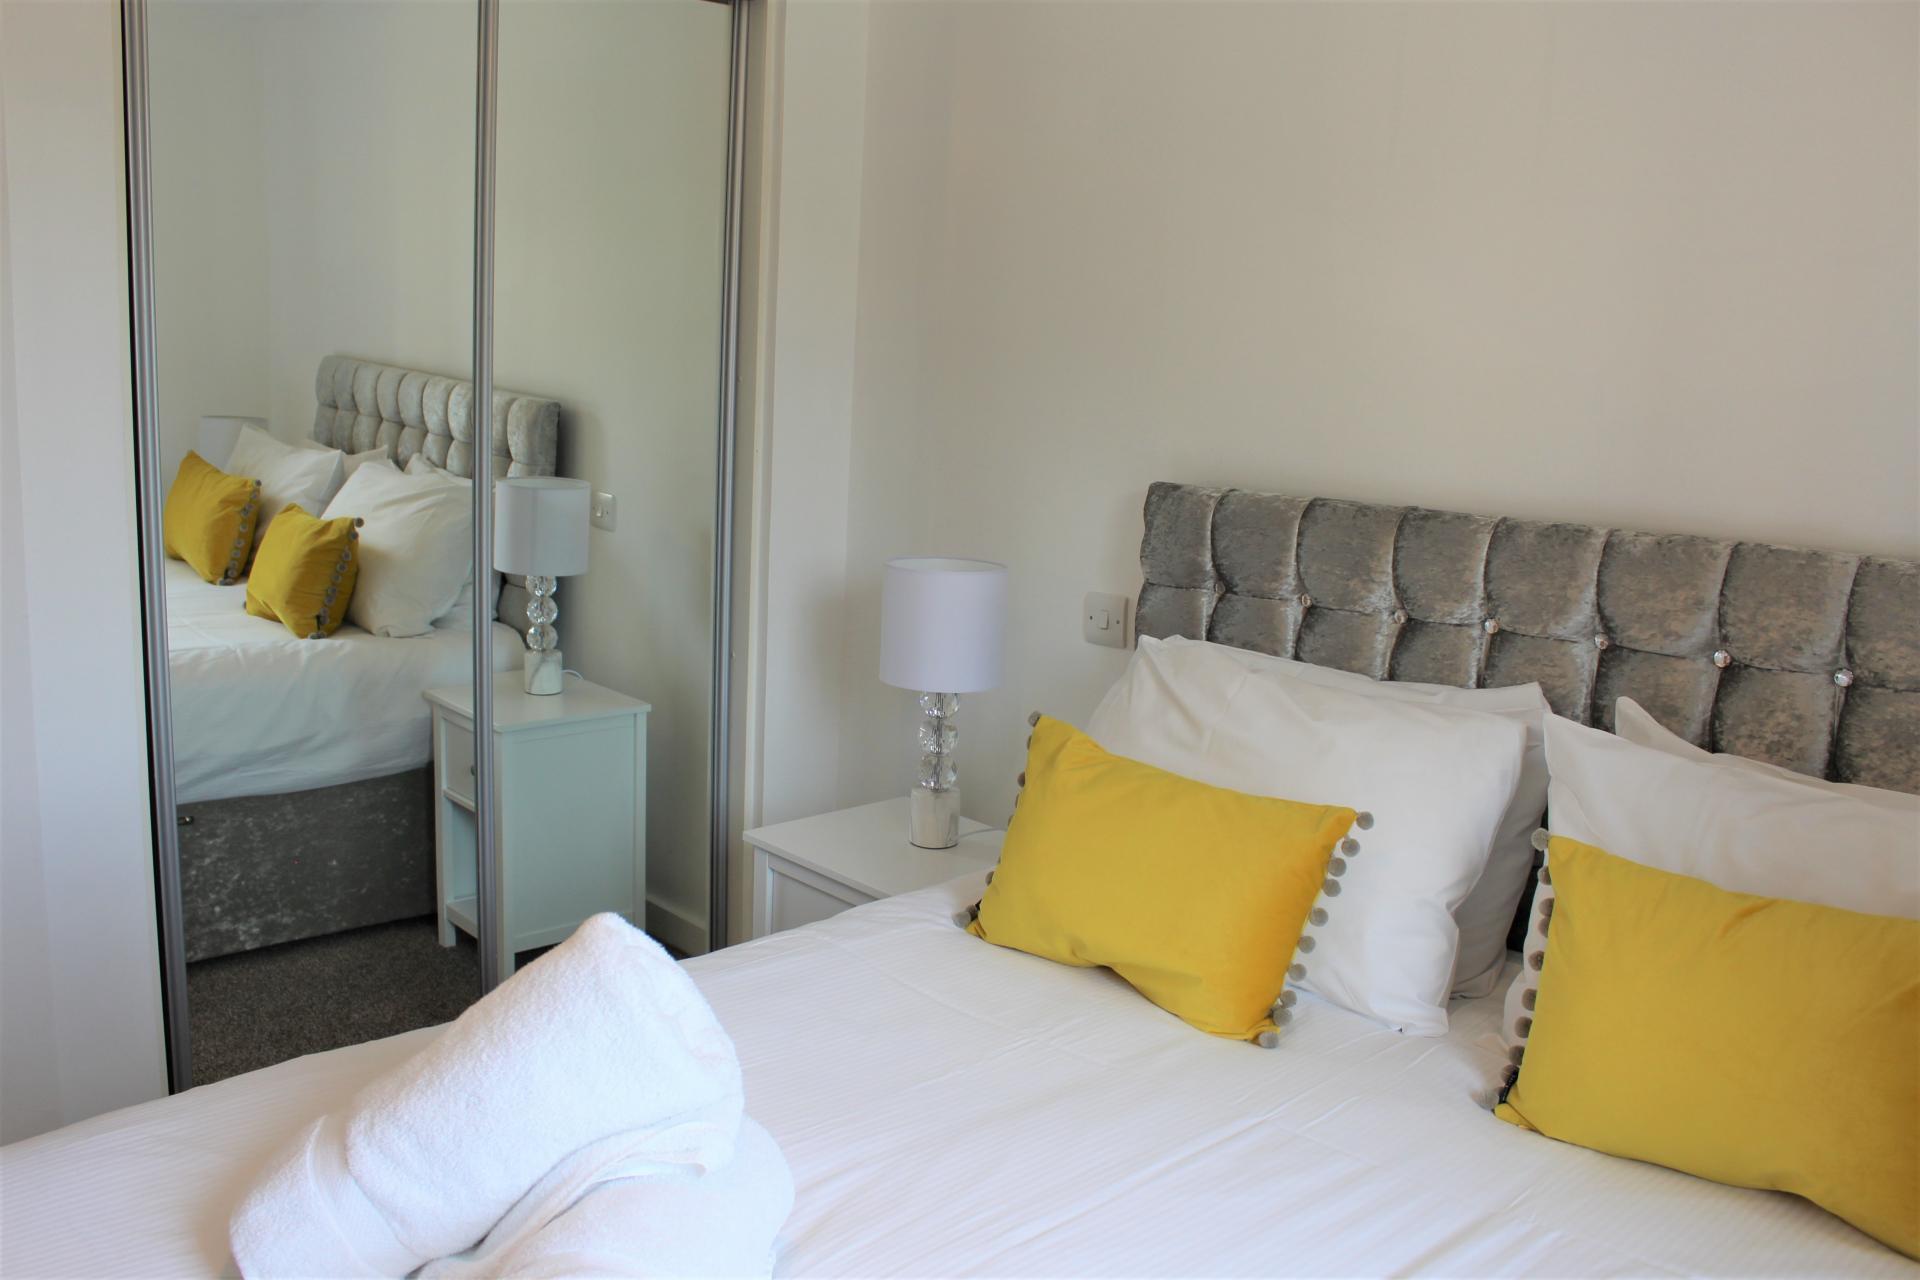 Bedding at Gunwharf Quays Apartments, Gunwharf Quays, Portsmouth - Citybase Apartments